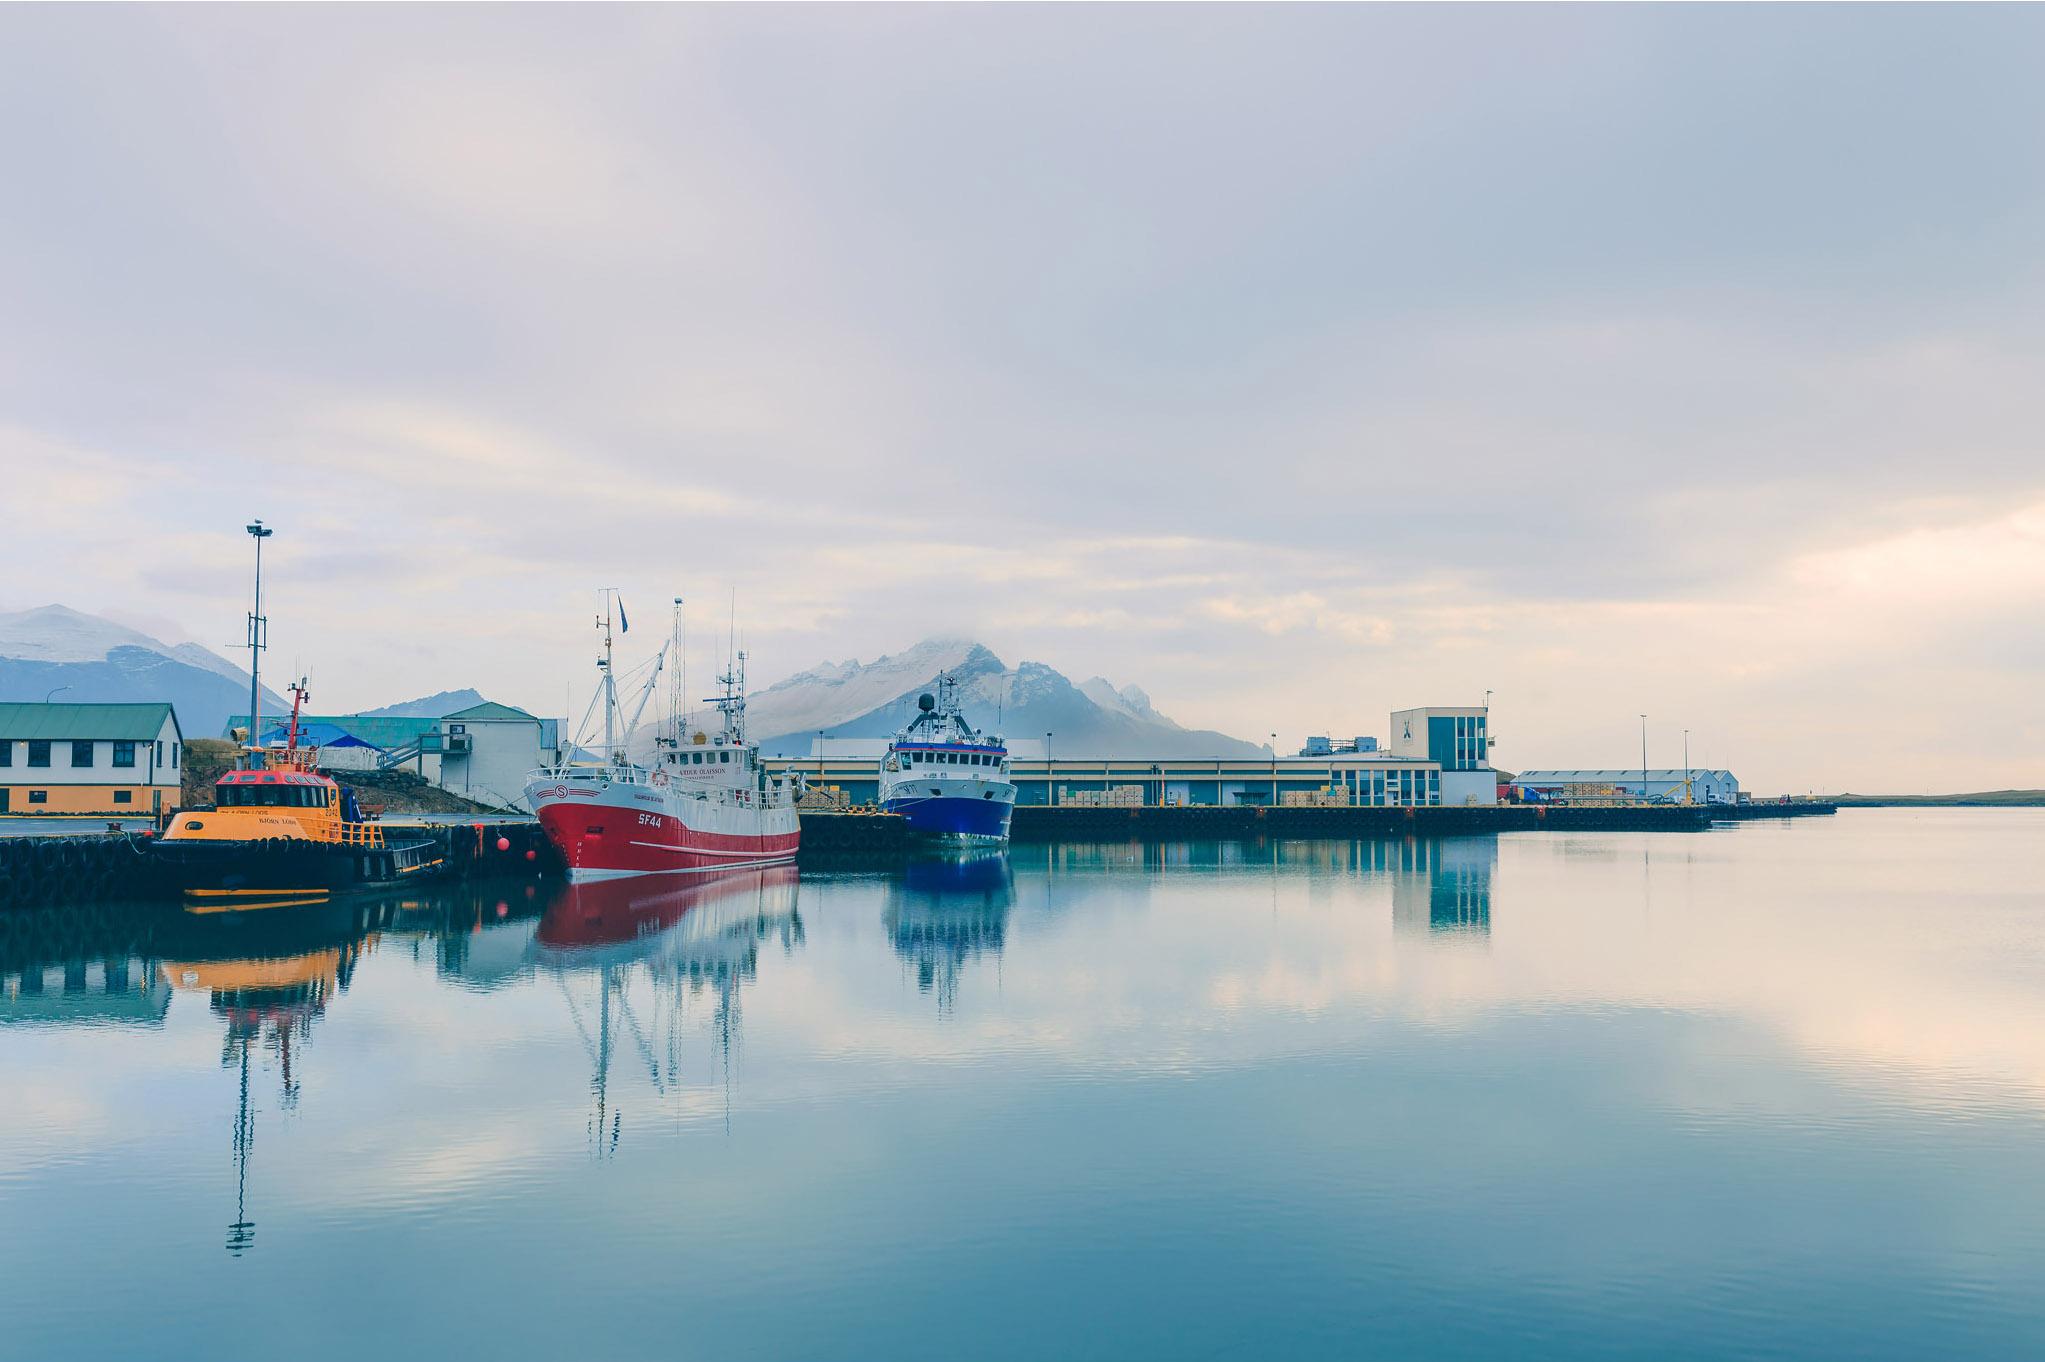 hofn, iceland, jennifer picard photography, travel photographer